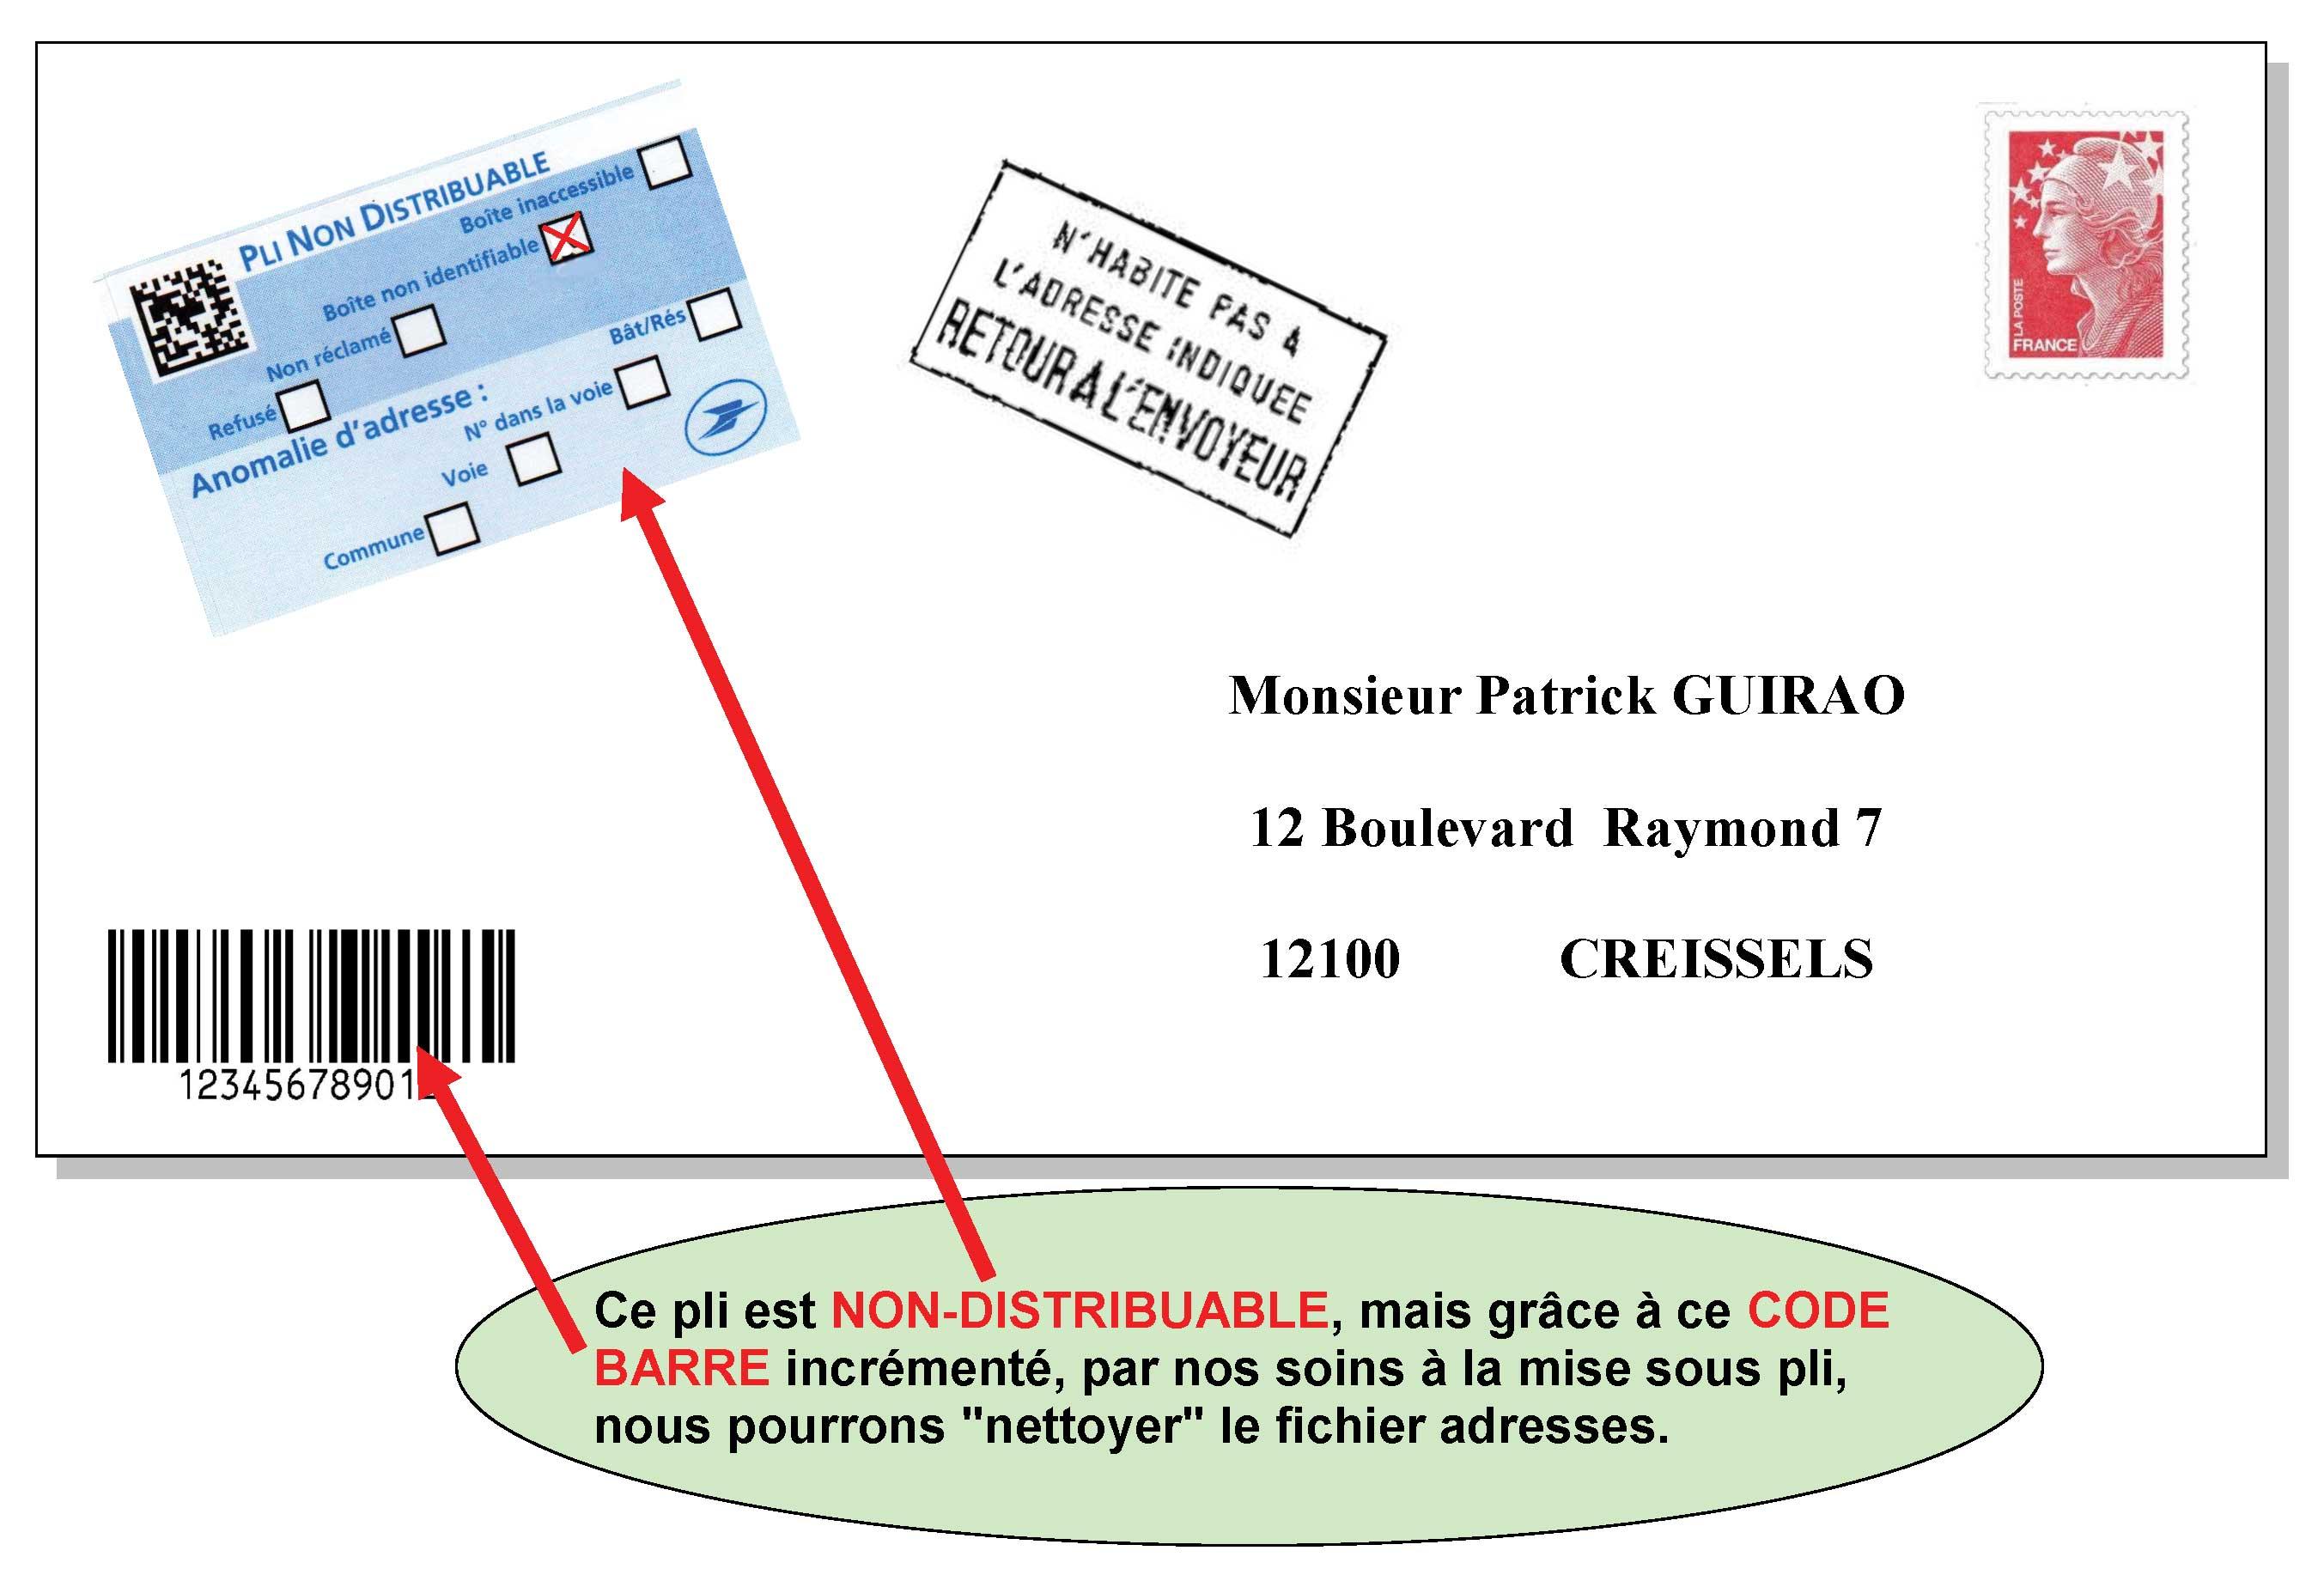 Code Barre DatamatrixIMAP Imprimerie